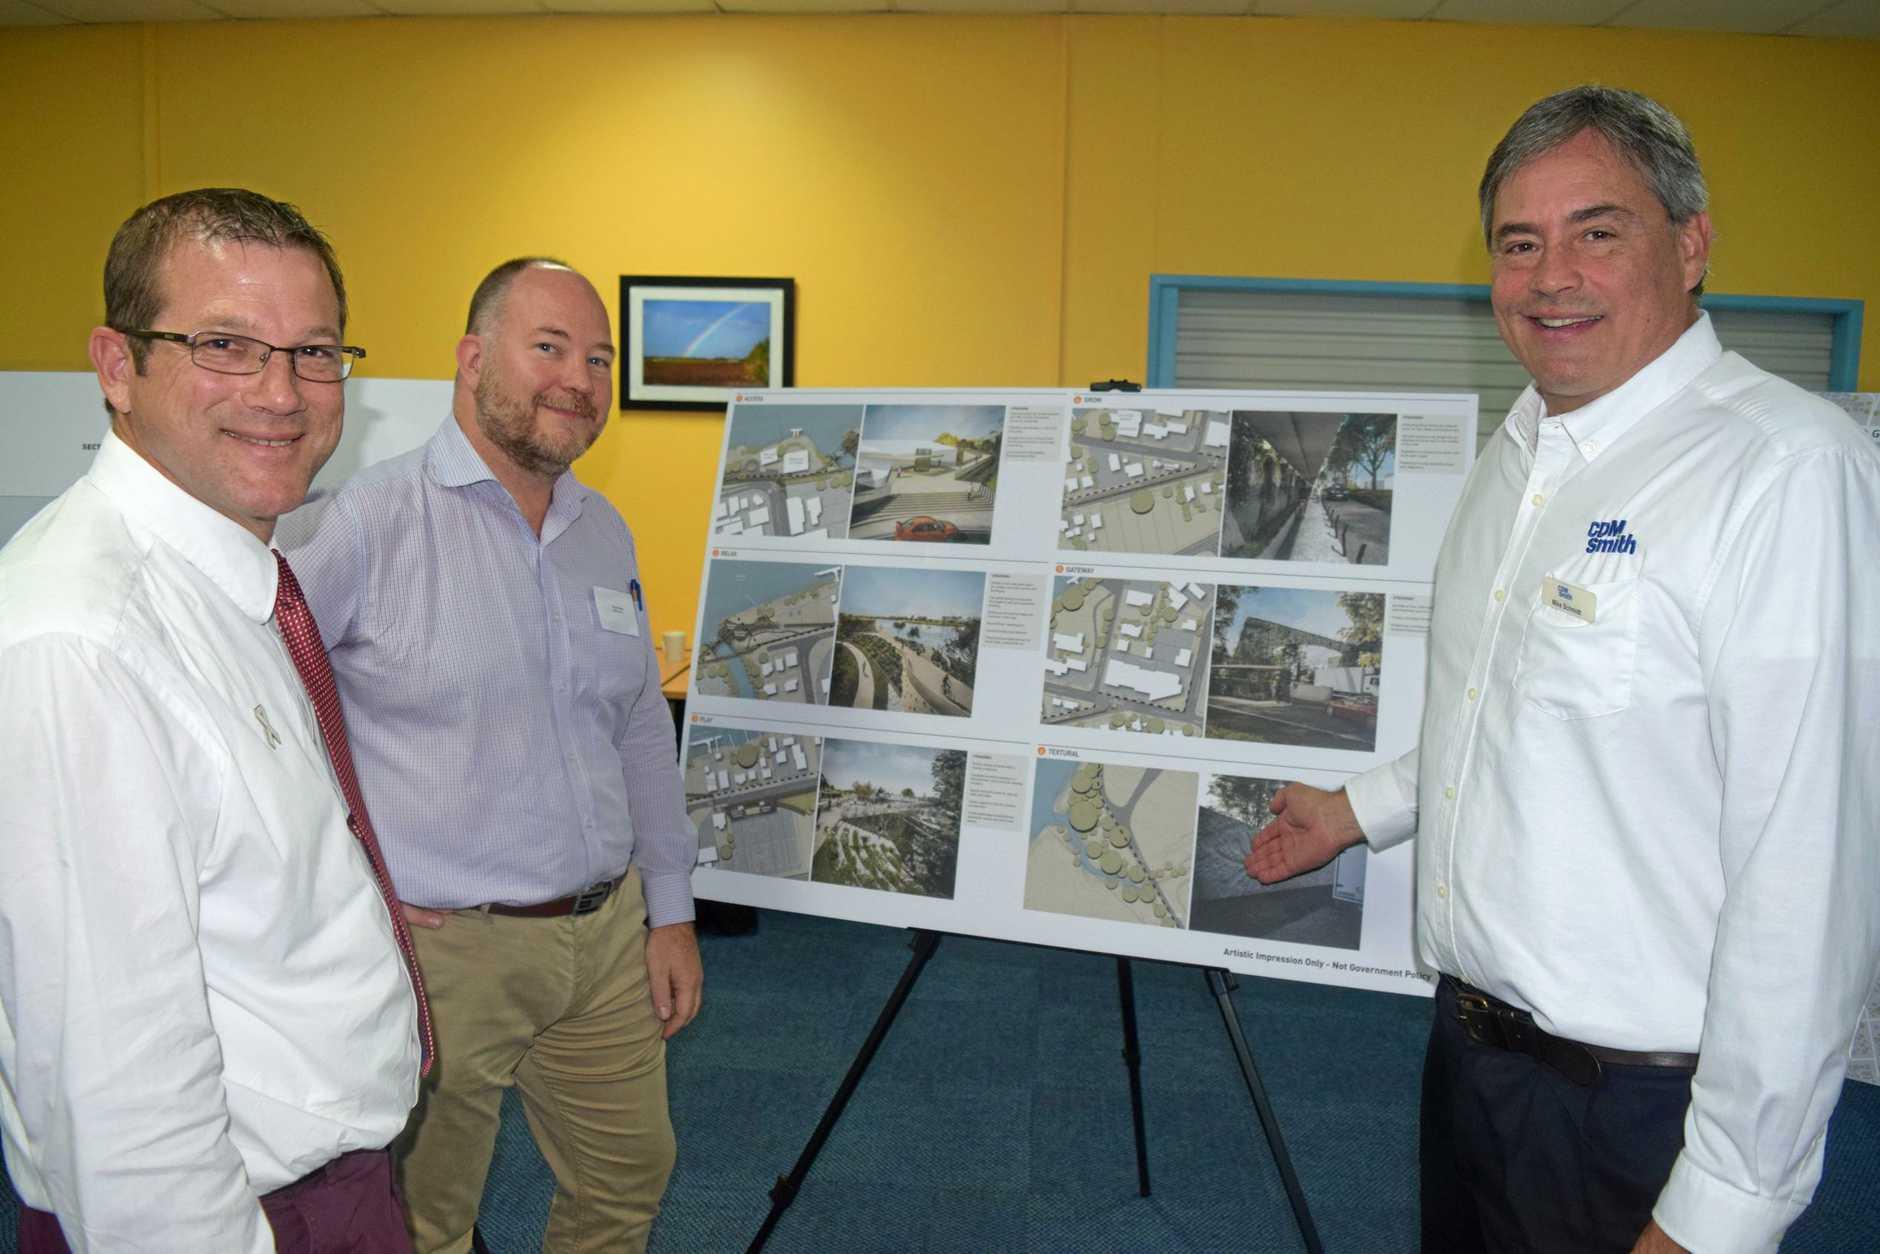 David Batt MP, CDM Smith managing principal Russell Merz and engineer Mike Schmidt.